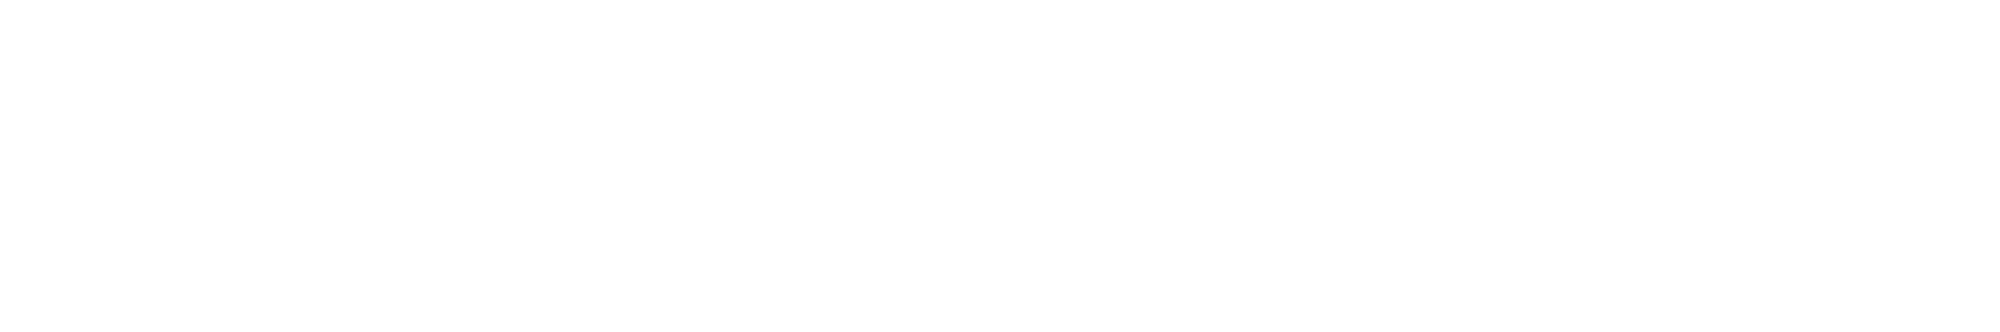 Micrsculpture_logo.png